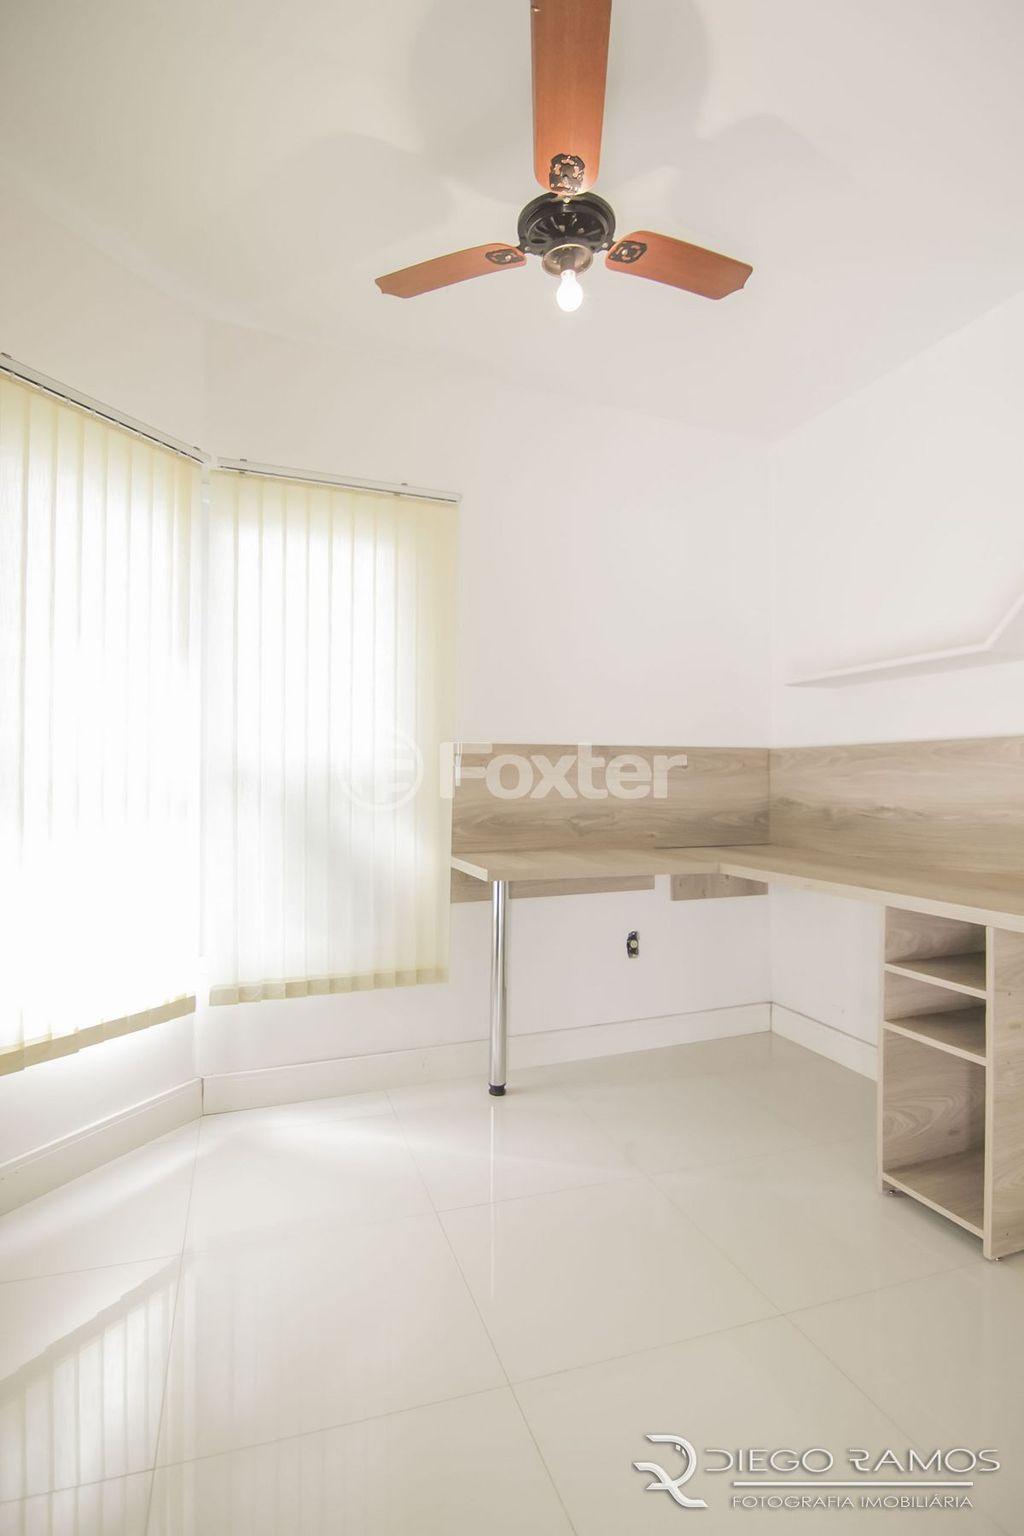 Casa 5 Dorm, Marechal Rondon, Canoas (143576) - Foto 6